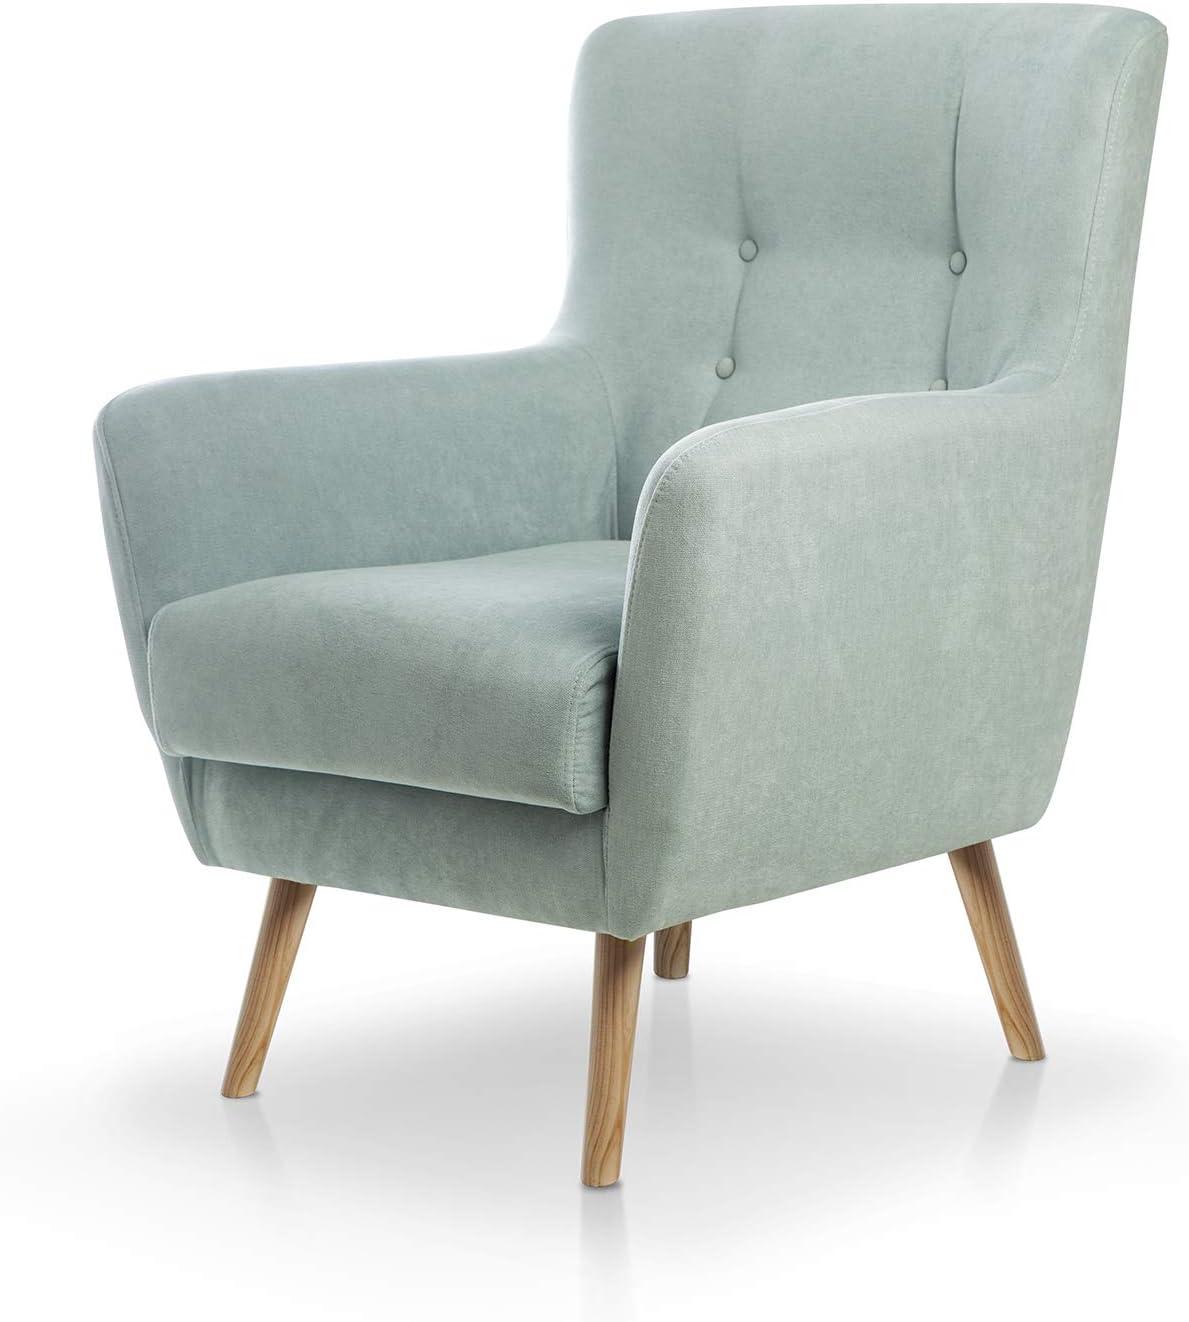 Butaca nórdica Izan de una Plaza, sillón tapizado en Tela Antimanchas Color Verde Agua